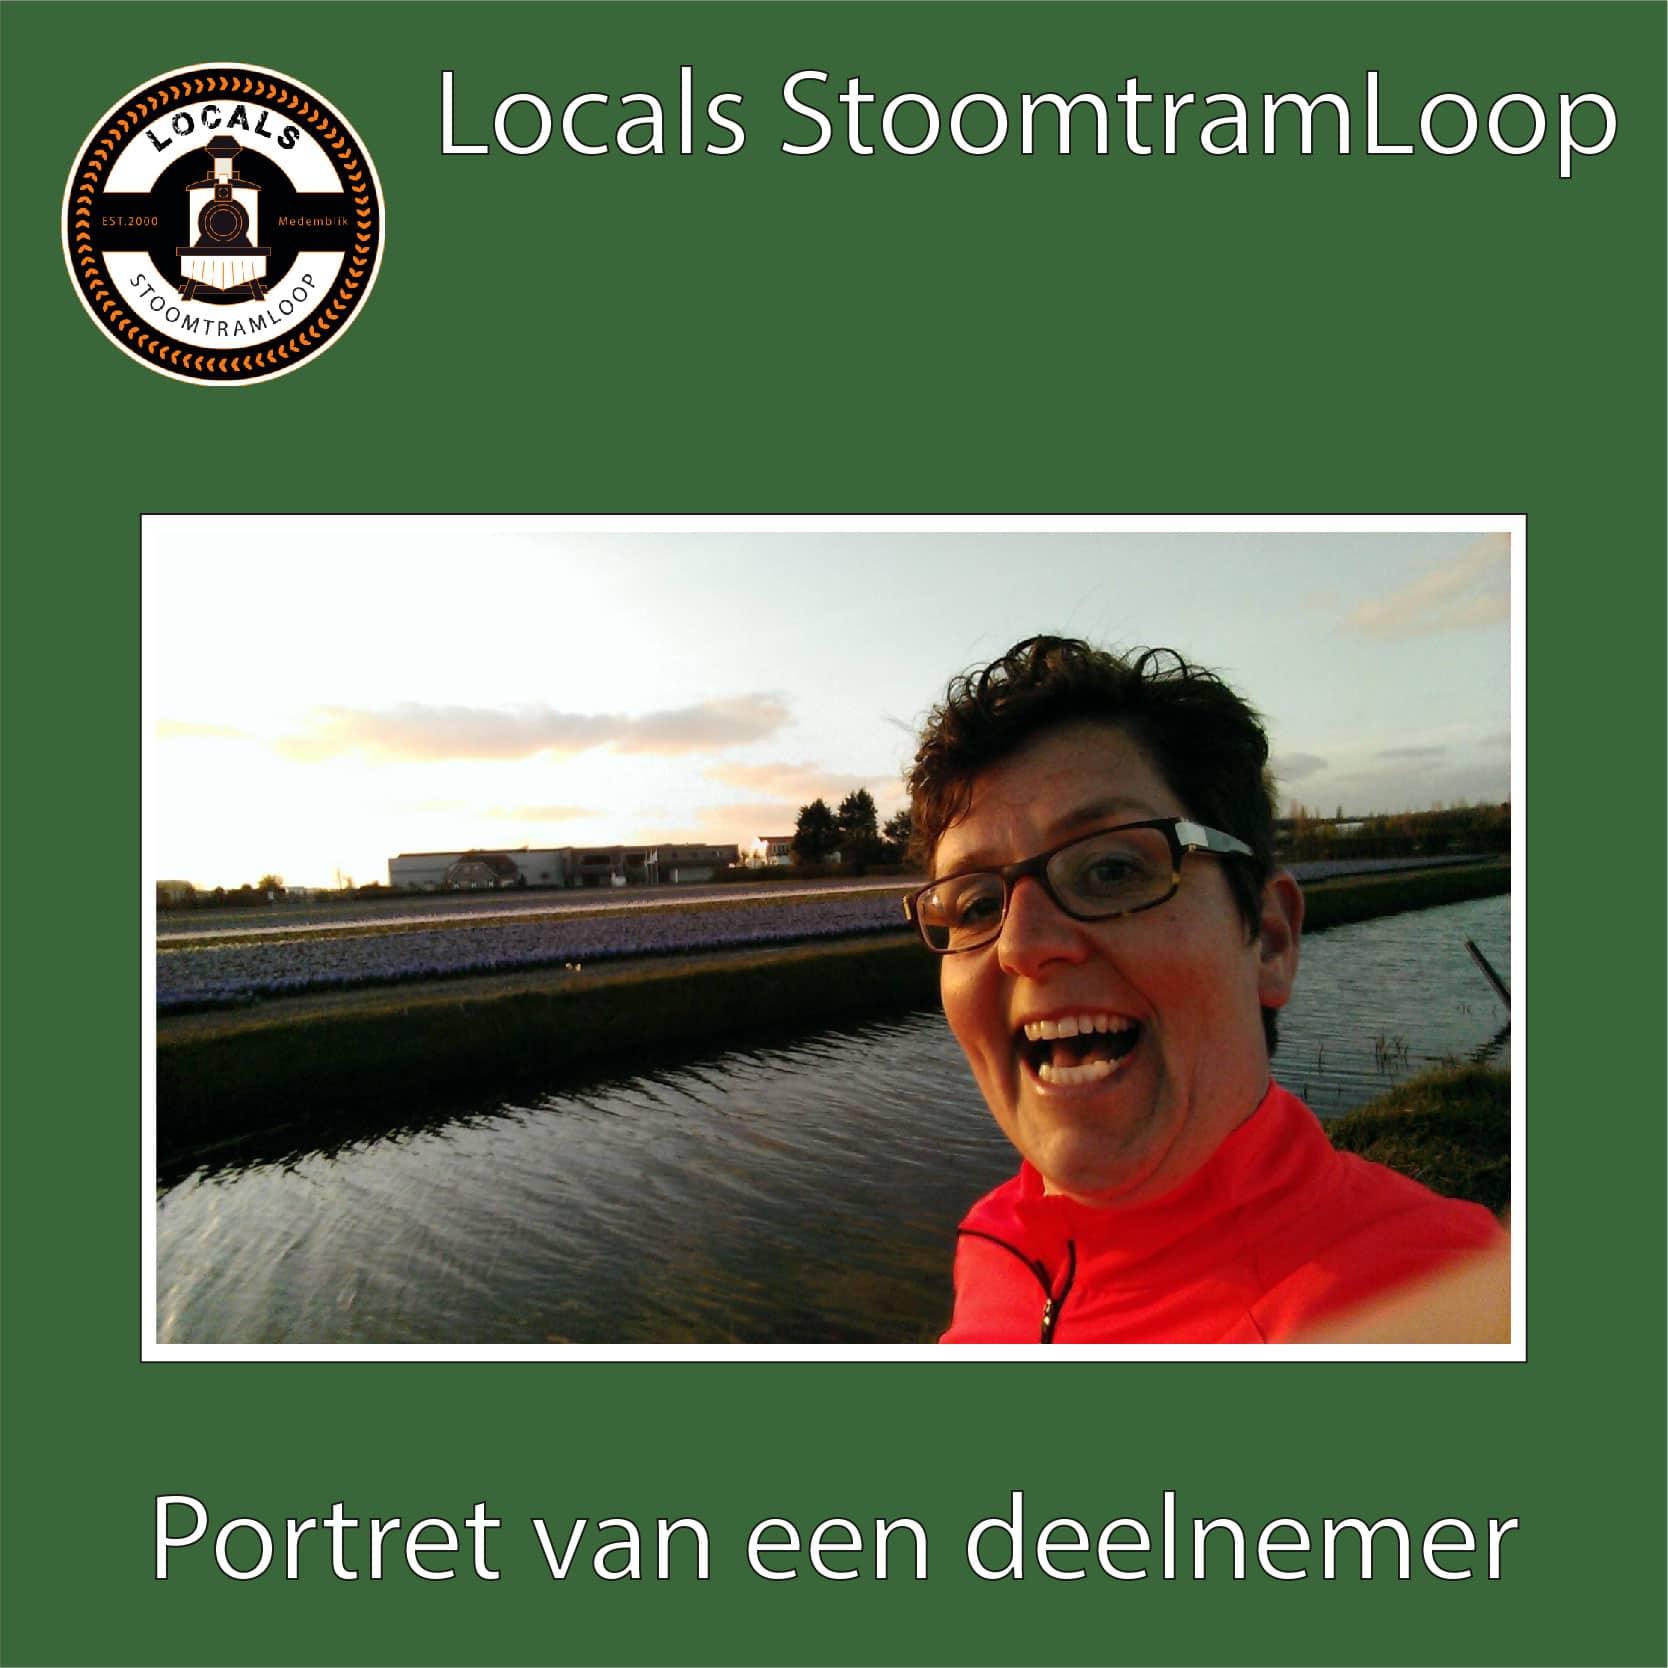 Deelnemer: Jolanda Stembert Stoomtramloop